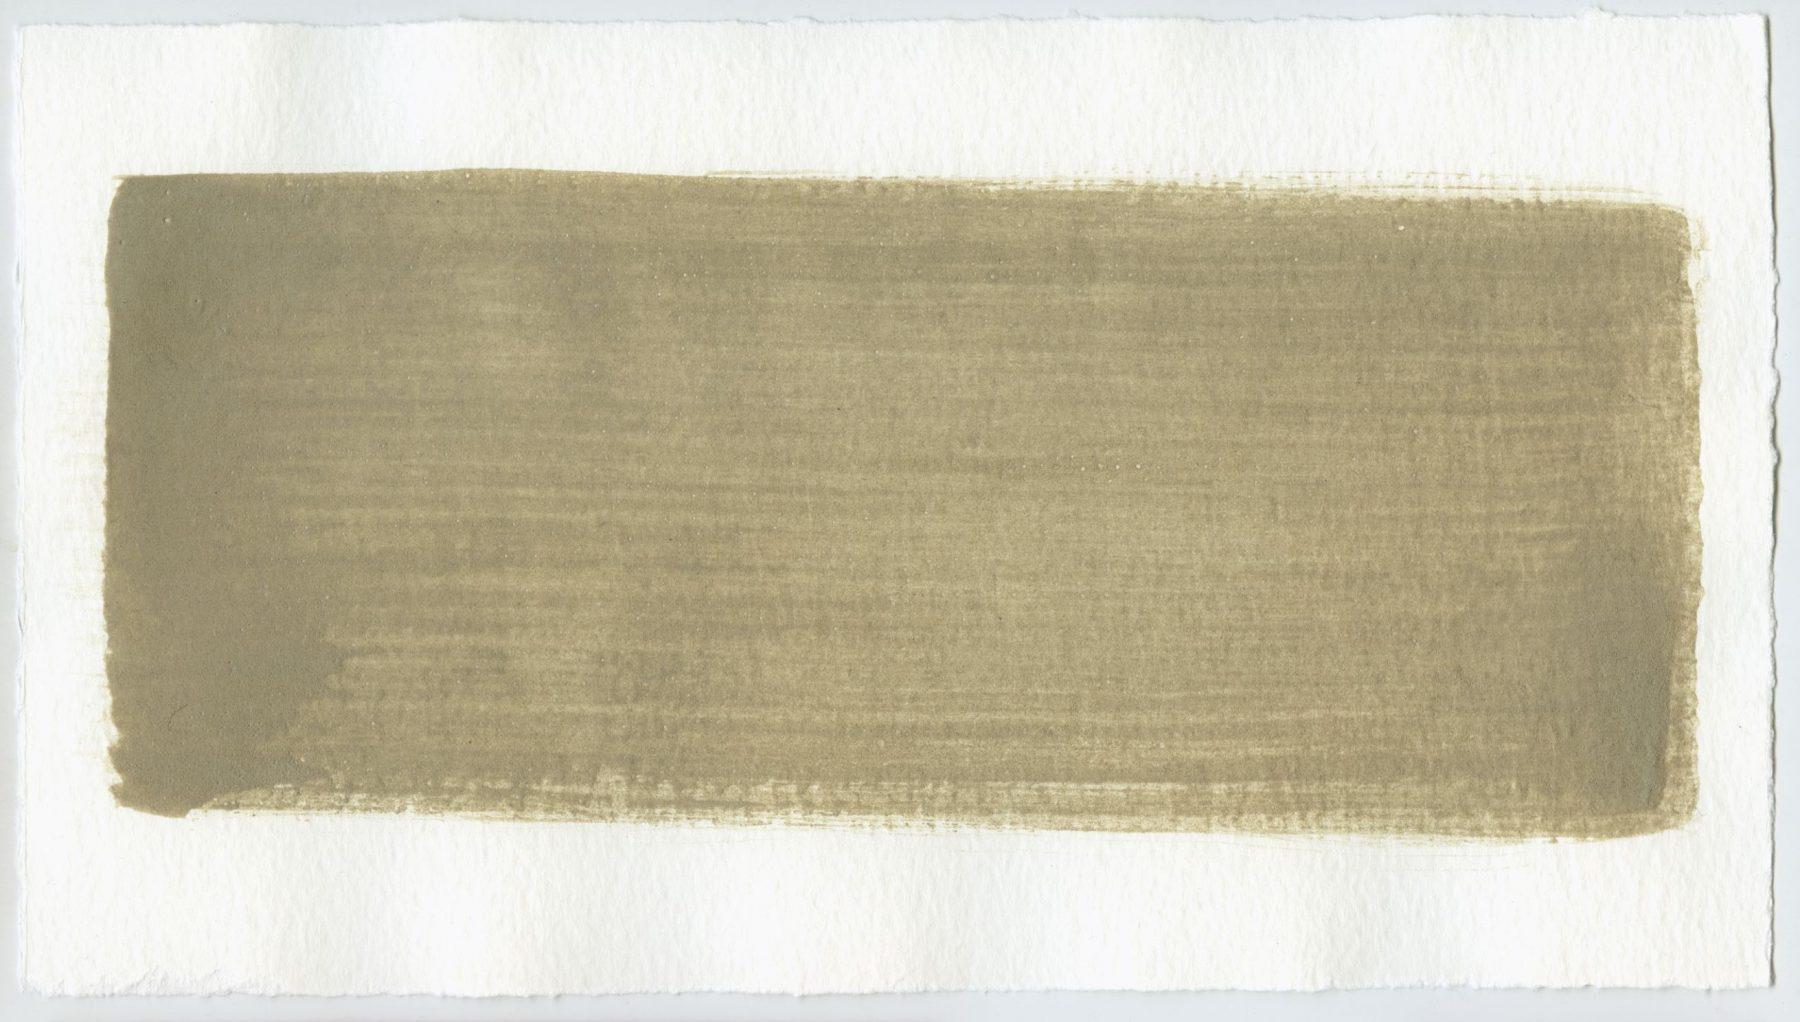 Brush stroke no. 11 - Selfmade pigment: Perekker grijs gebrand